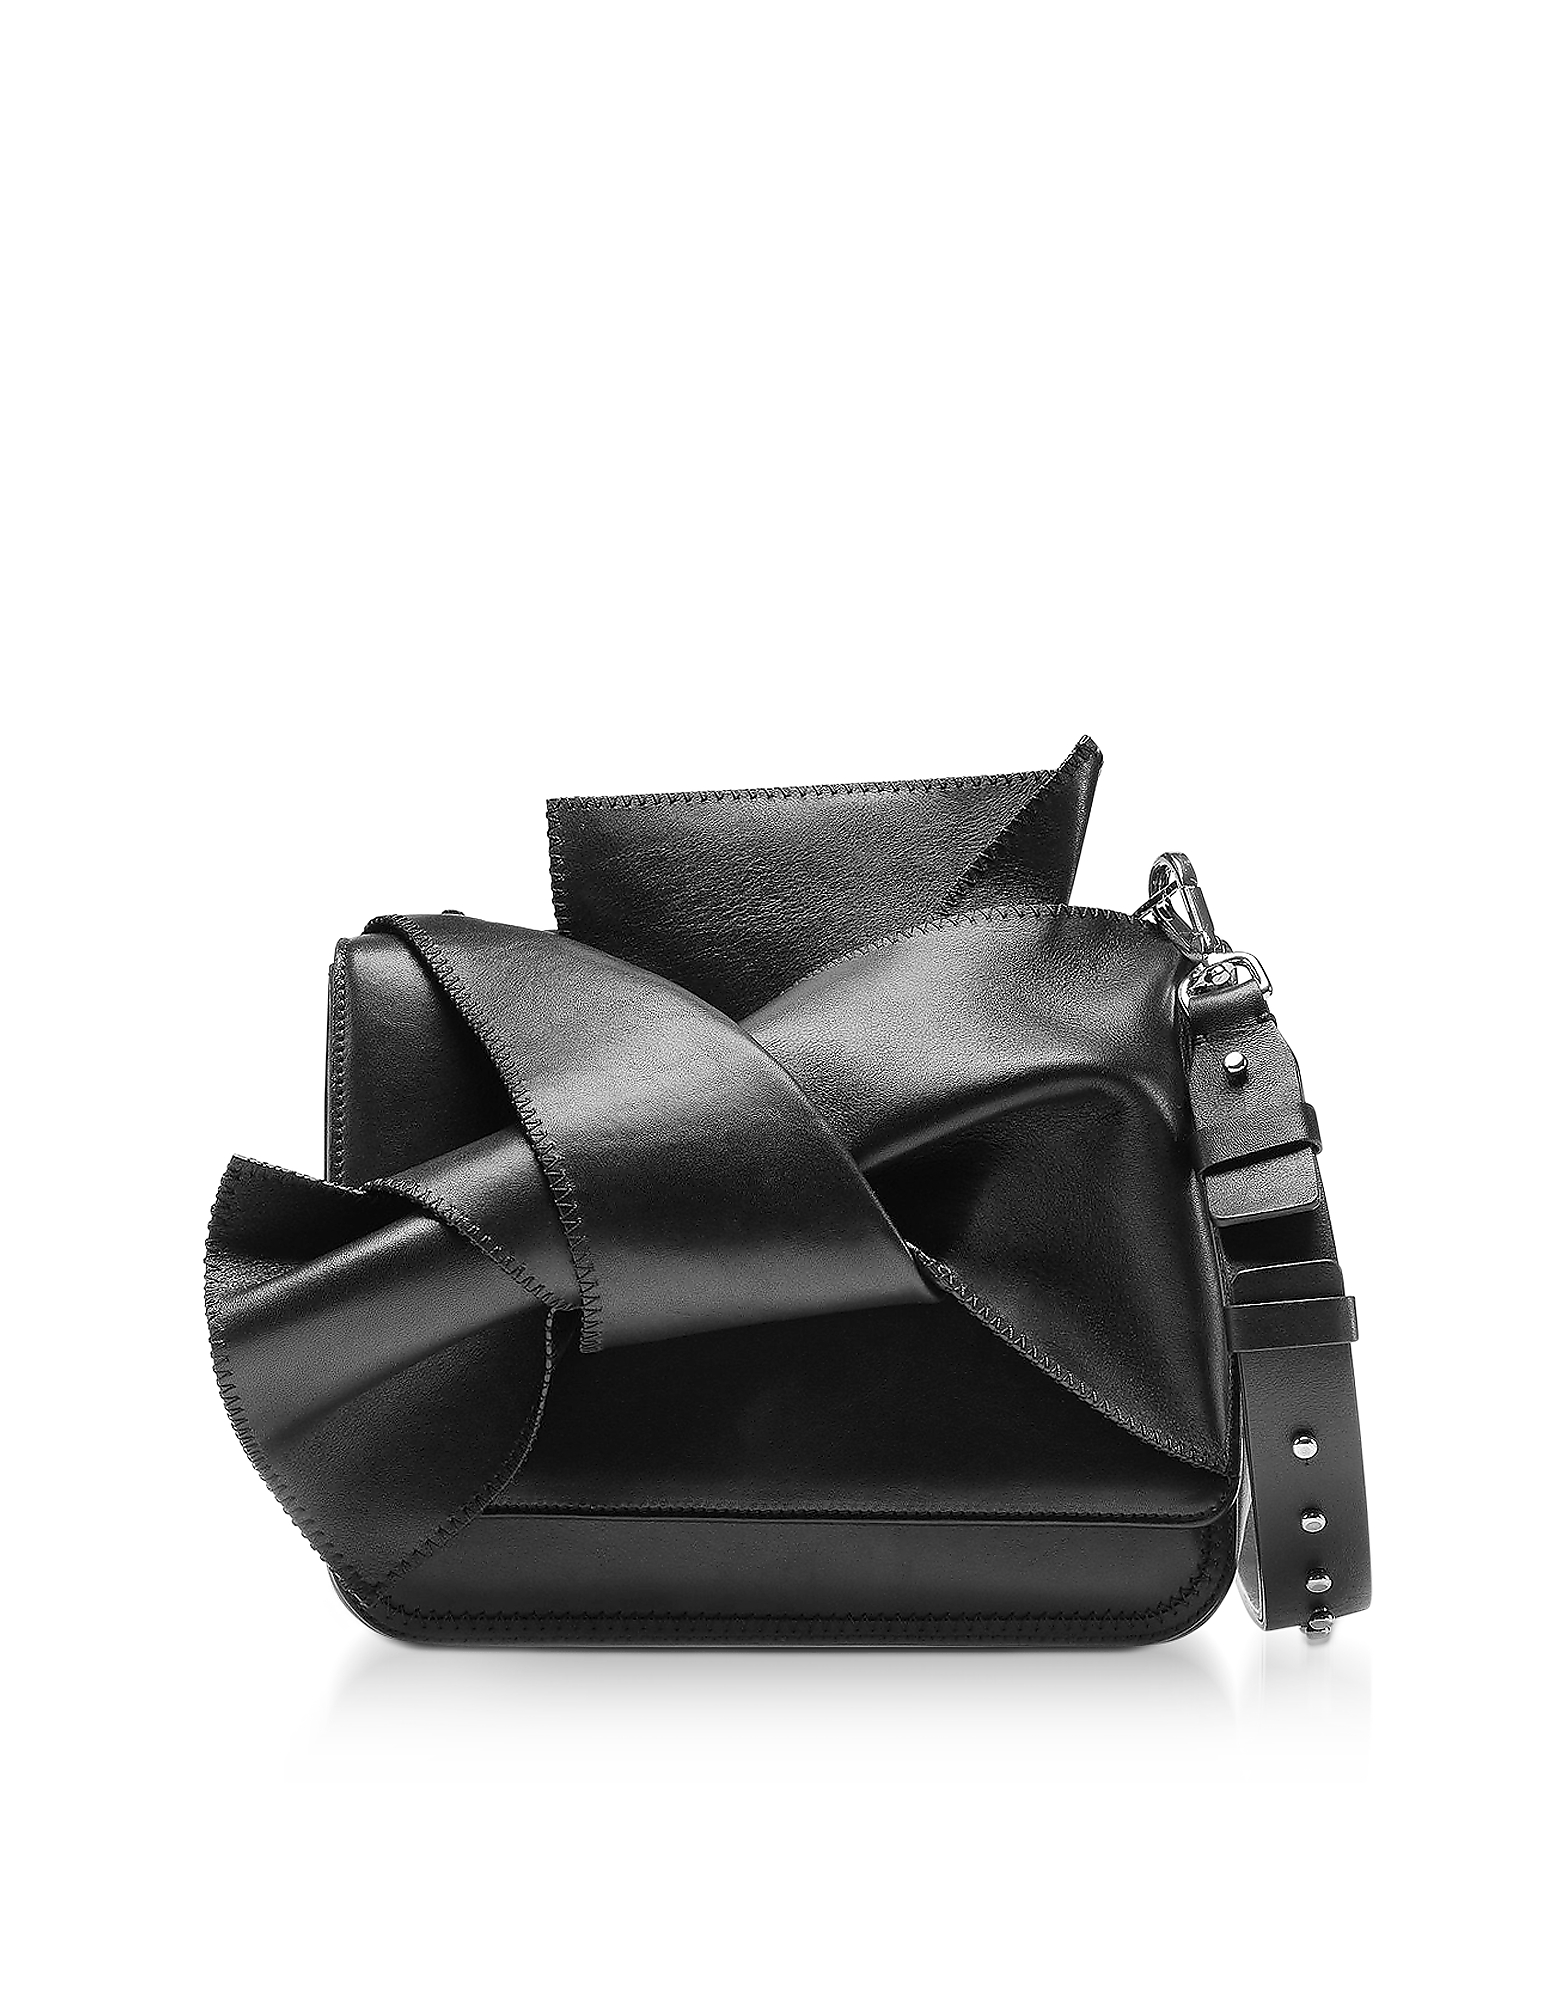 N°21 Handbags, Small Black Leather Bow Shoulder Bag